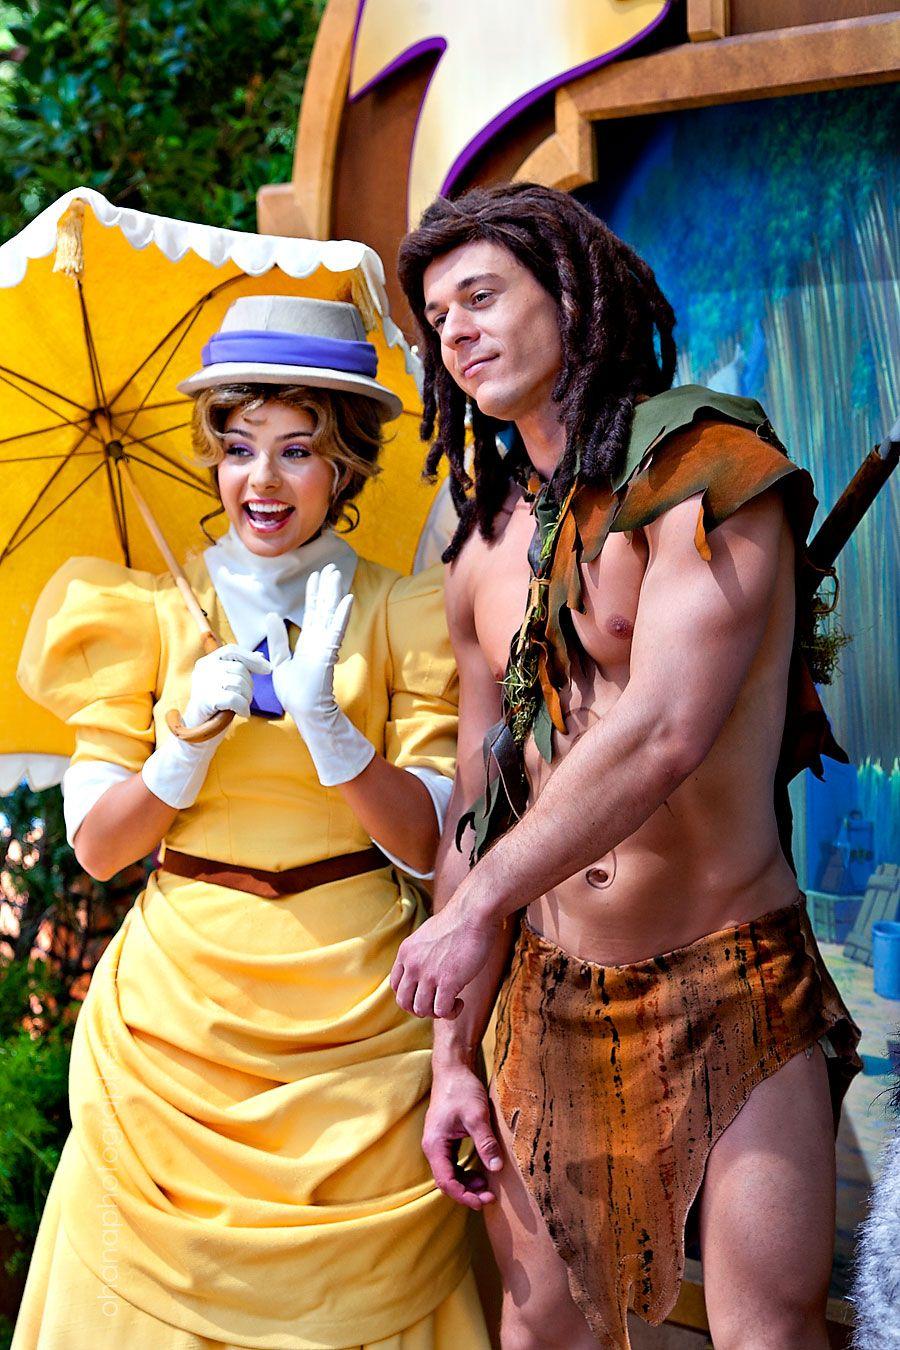 Disneyland Long Lost Friends week. Tarzan and Jane #disneyland #disneycharacters #tarzan #limitedtimemagic